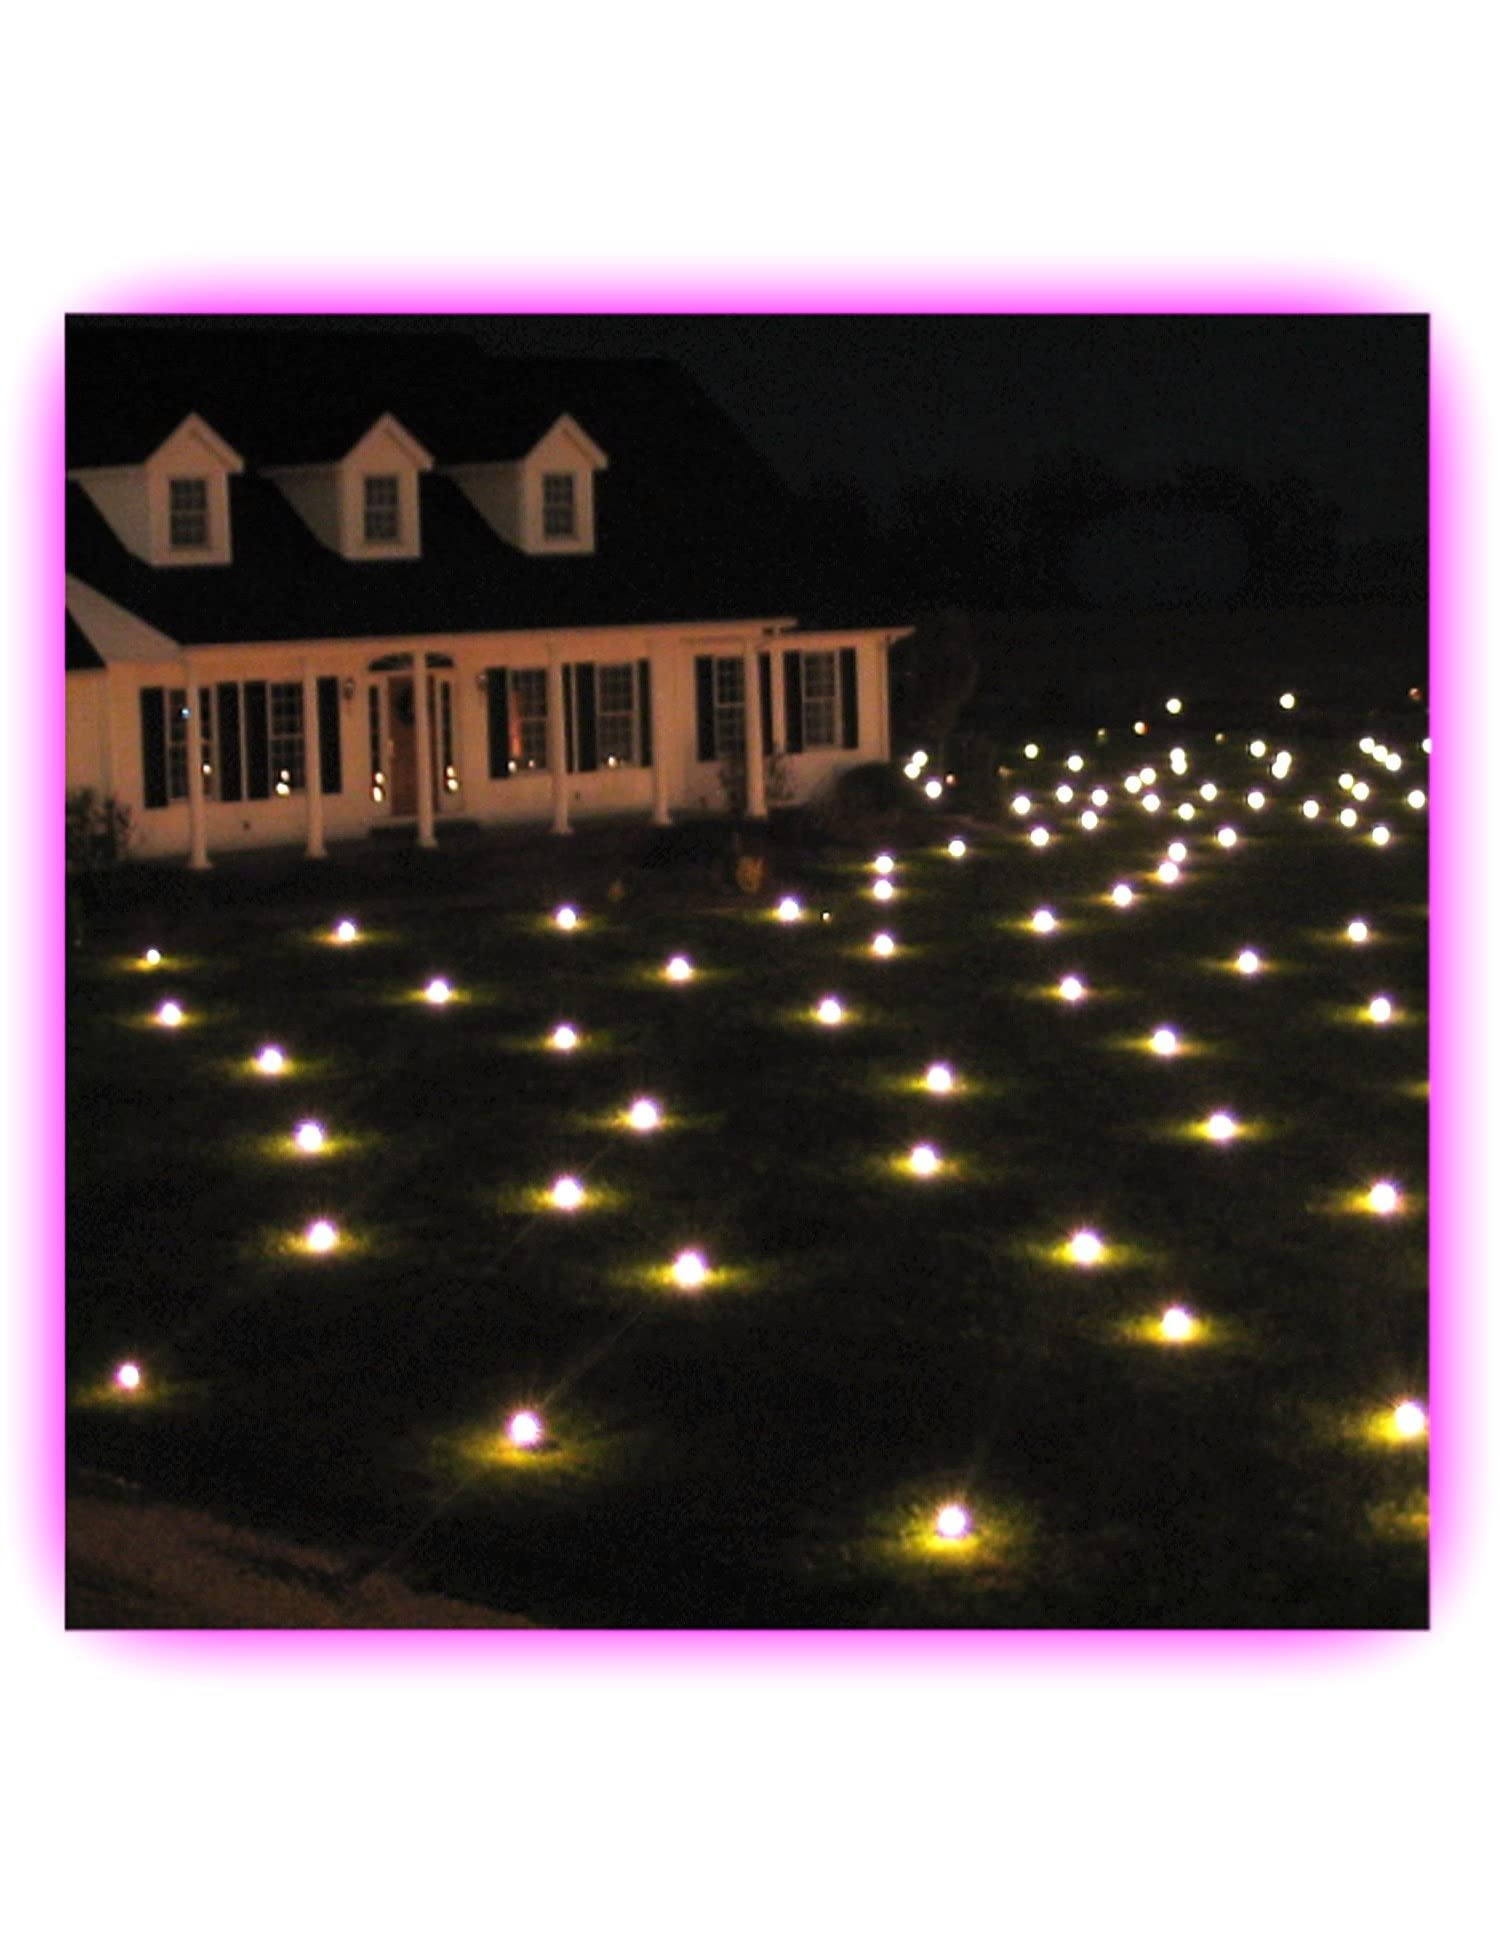 lawn lights illuminated outdoor decoration - Christmas Lawn Lights Illuminated Outdoor Decoration